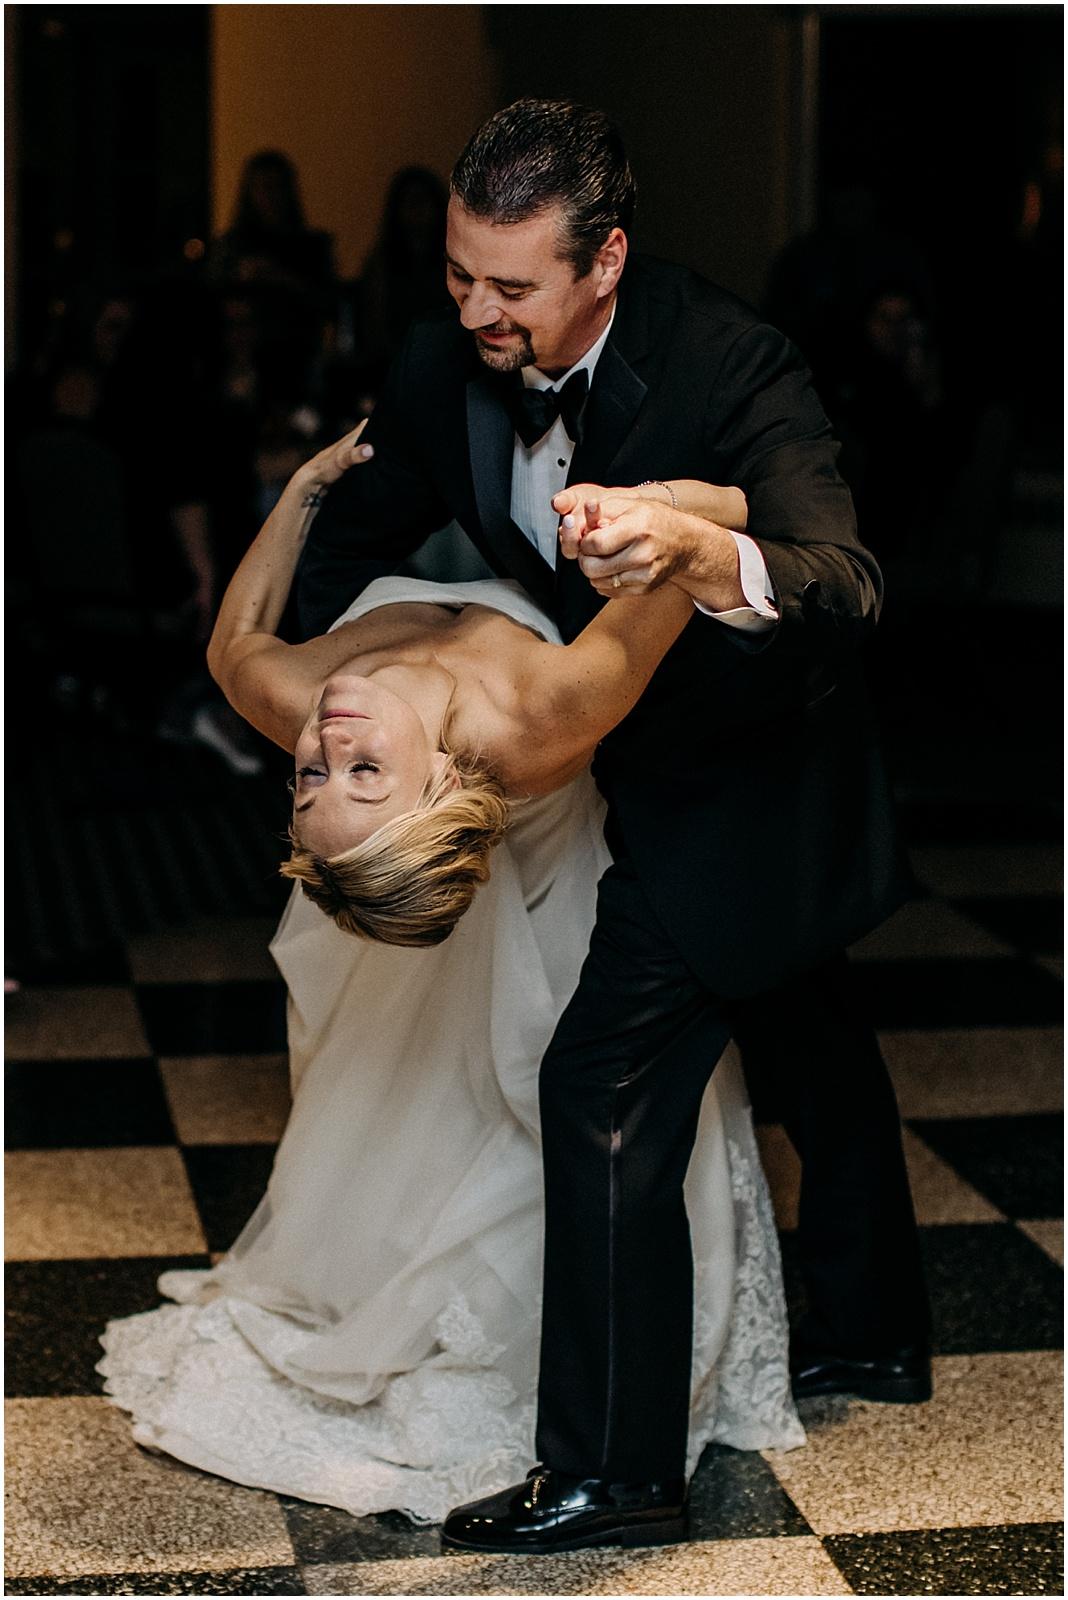 glen_echo_st_louis_mo_wedding_0140.jpg